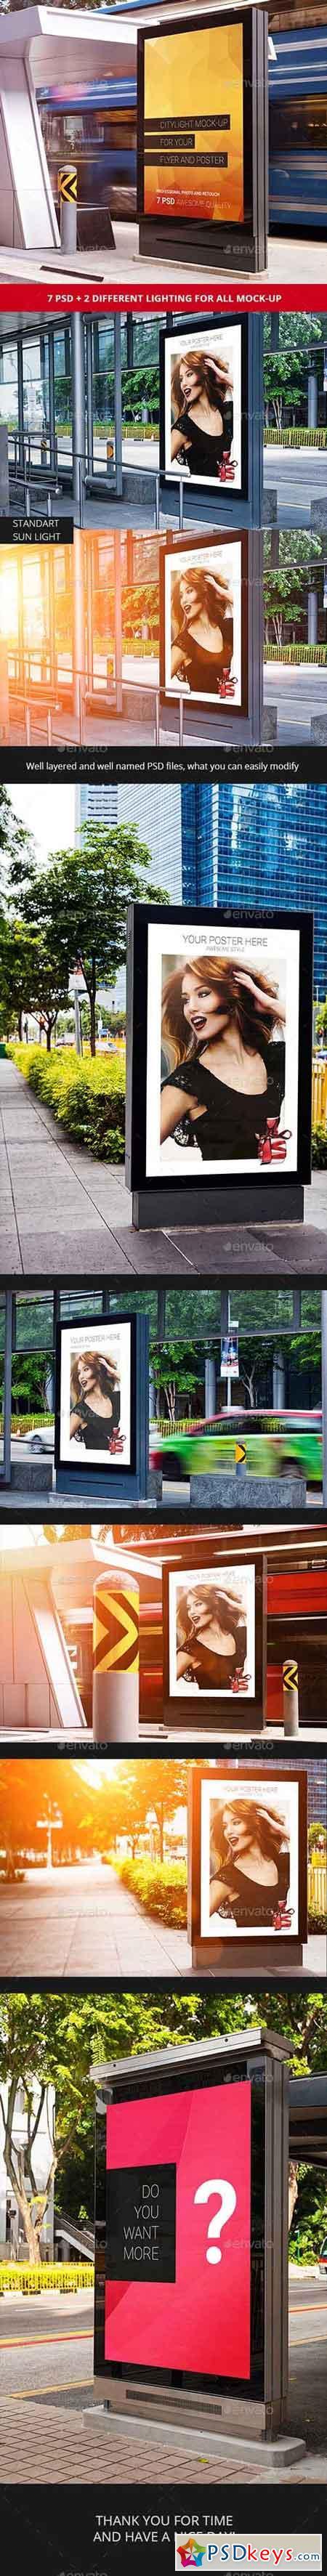 7 Citylight Poster Mock-Up 14404483